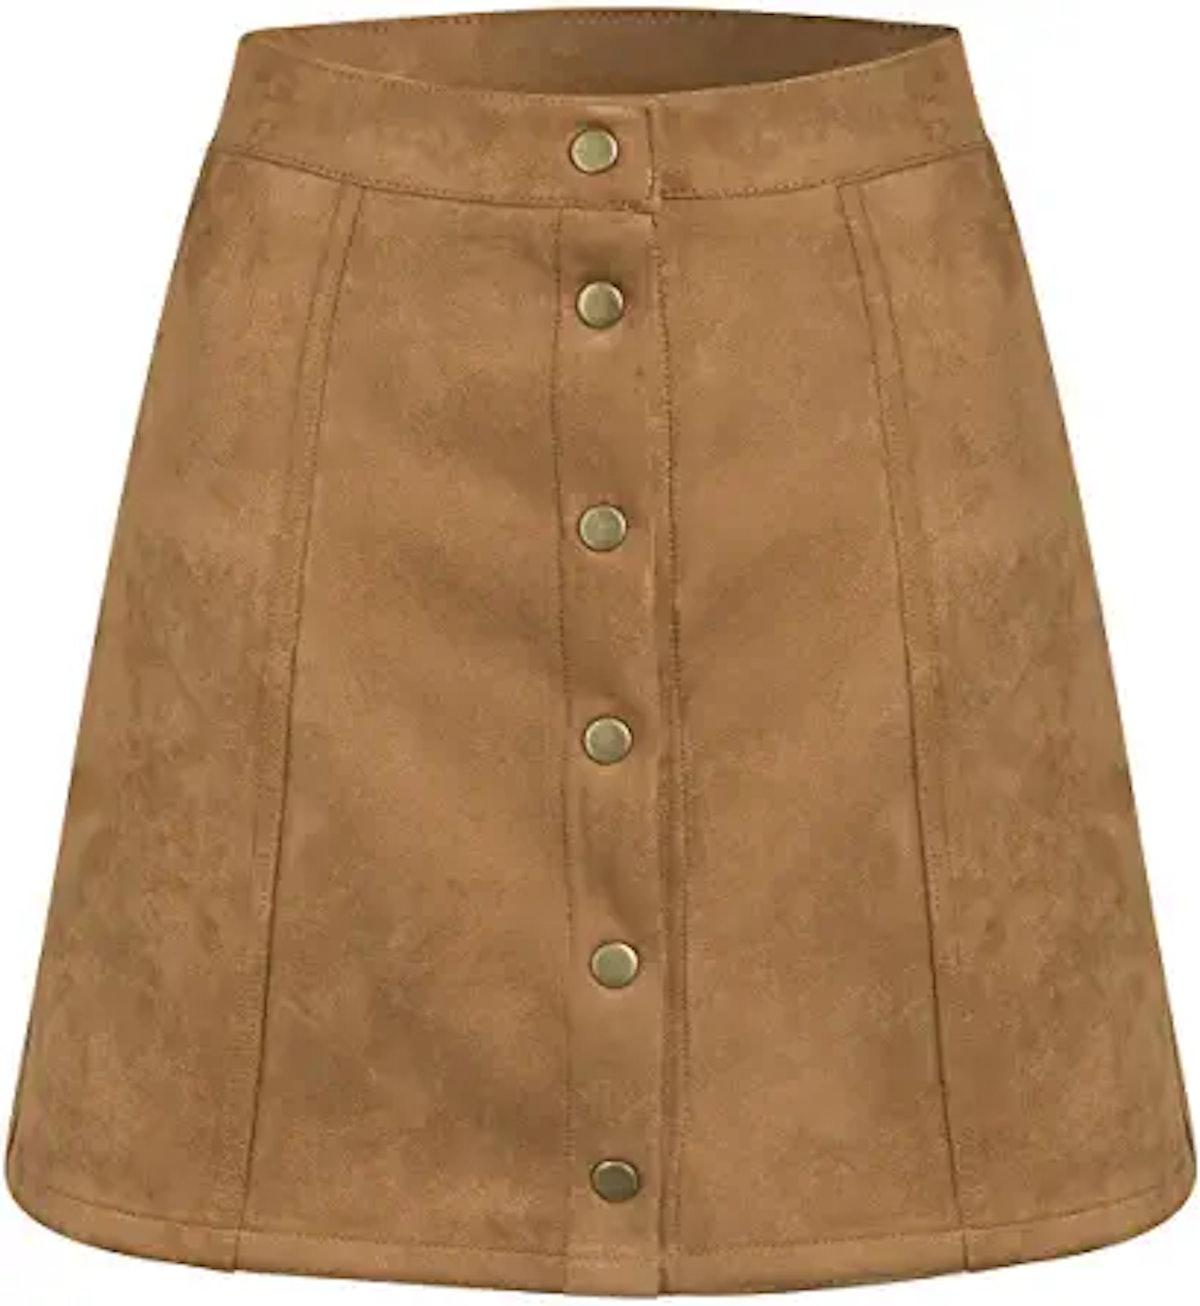 PERSUN Women's High Waist Faux Suede Button Front Plain A-Line Mini Skirt